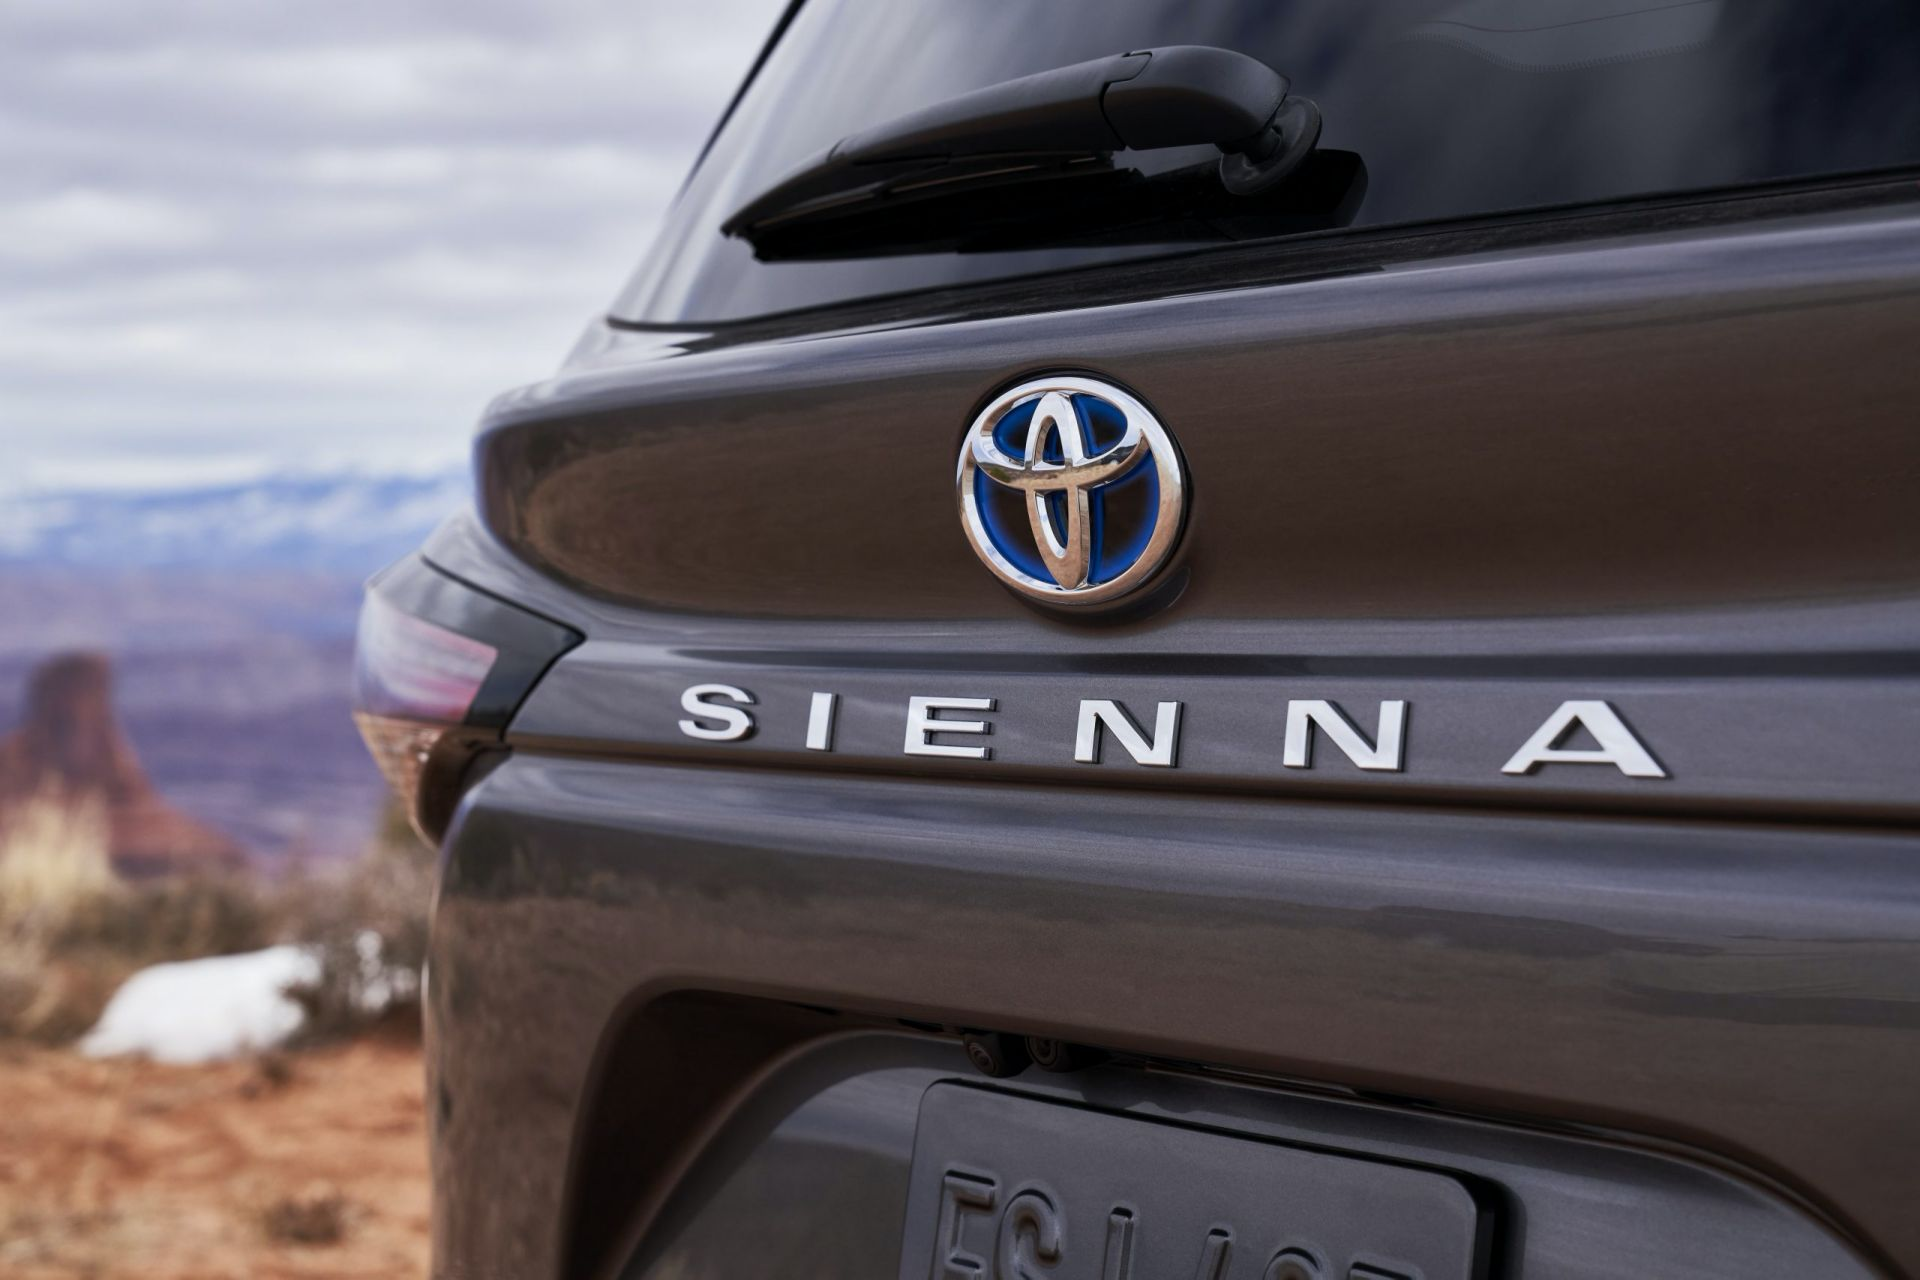 sienna toyota 2021 hybrid awd minivan unveiled bold refrigerator autoevolution goes passengers changes wait steve including says platinum drive wheel